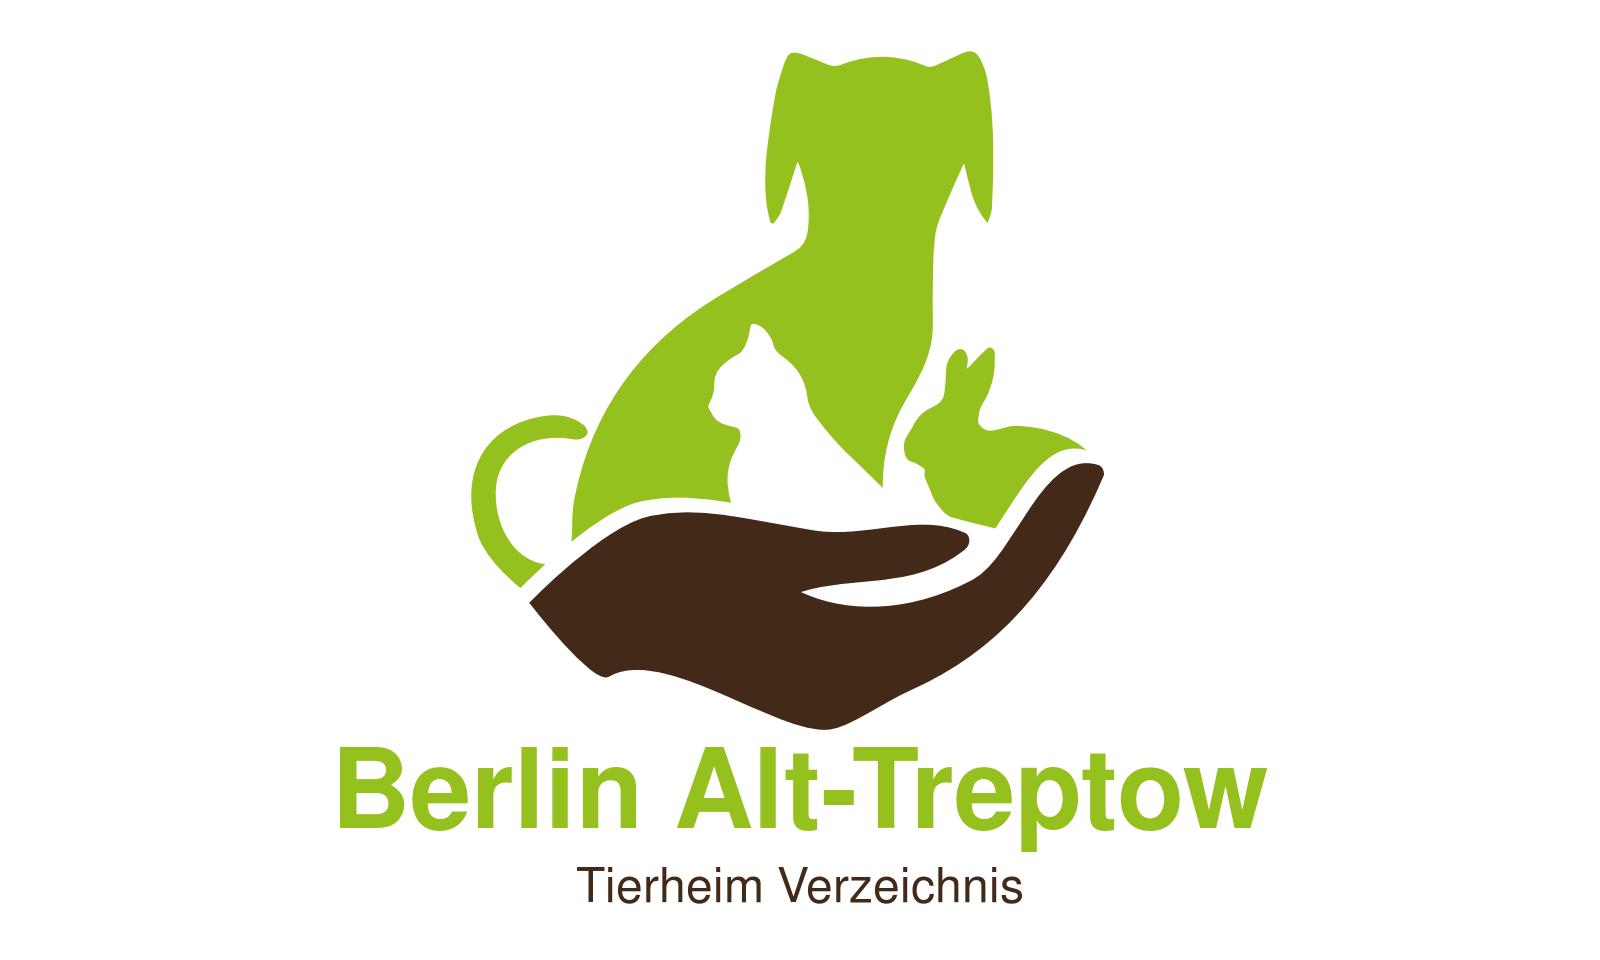 Tierheim Berlin Alt-Treptow